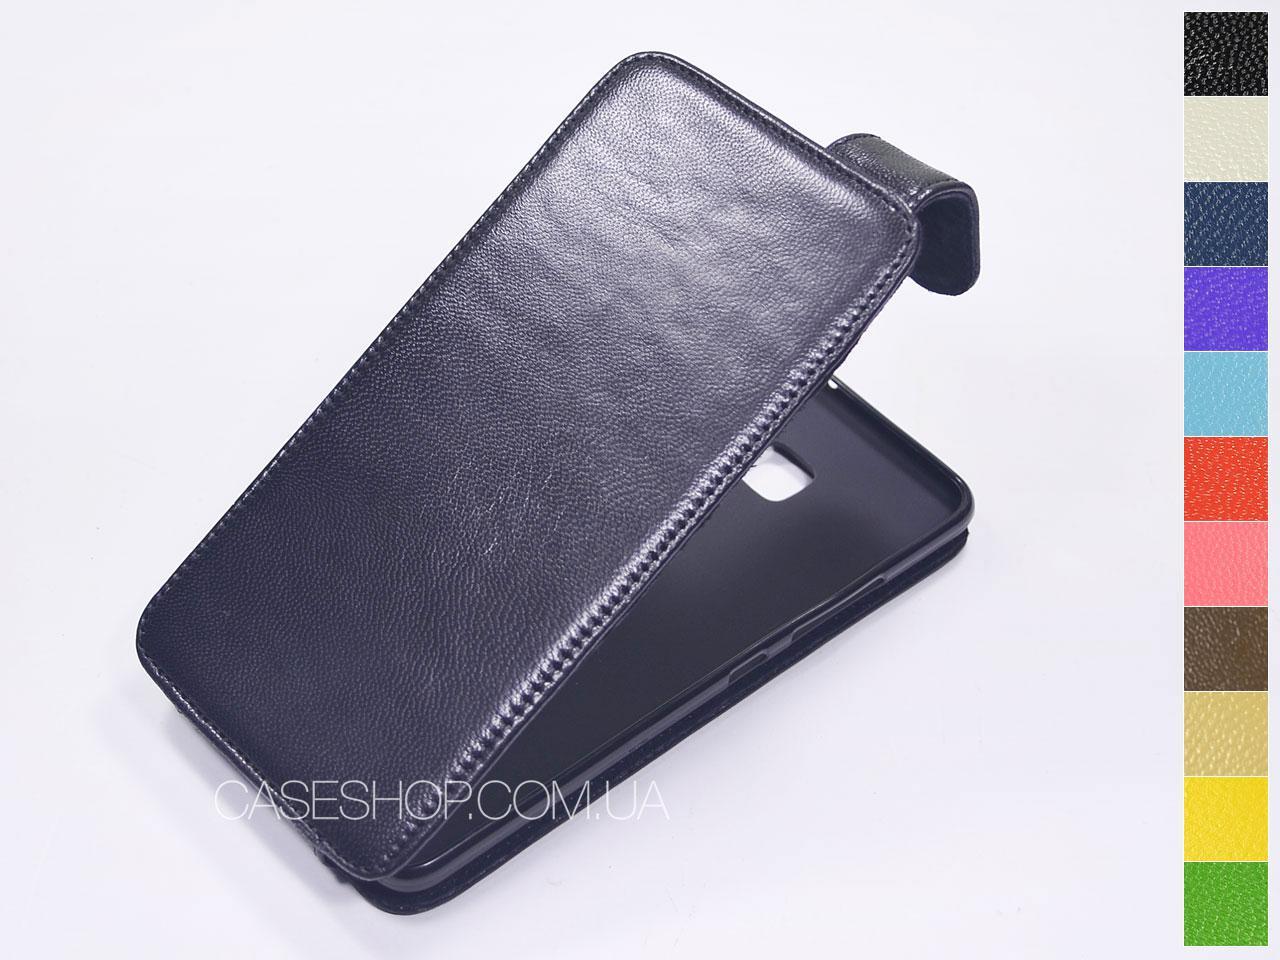 Чехол Huawei Honor 5C Gecko Book Black G-BOOK-HUAW-5C-BL